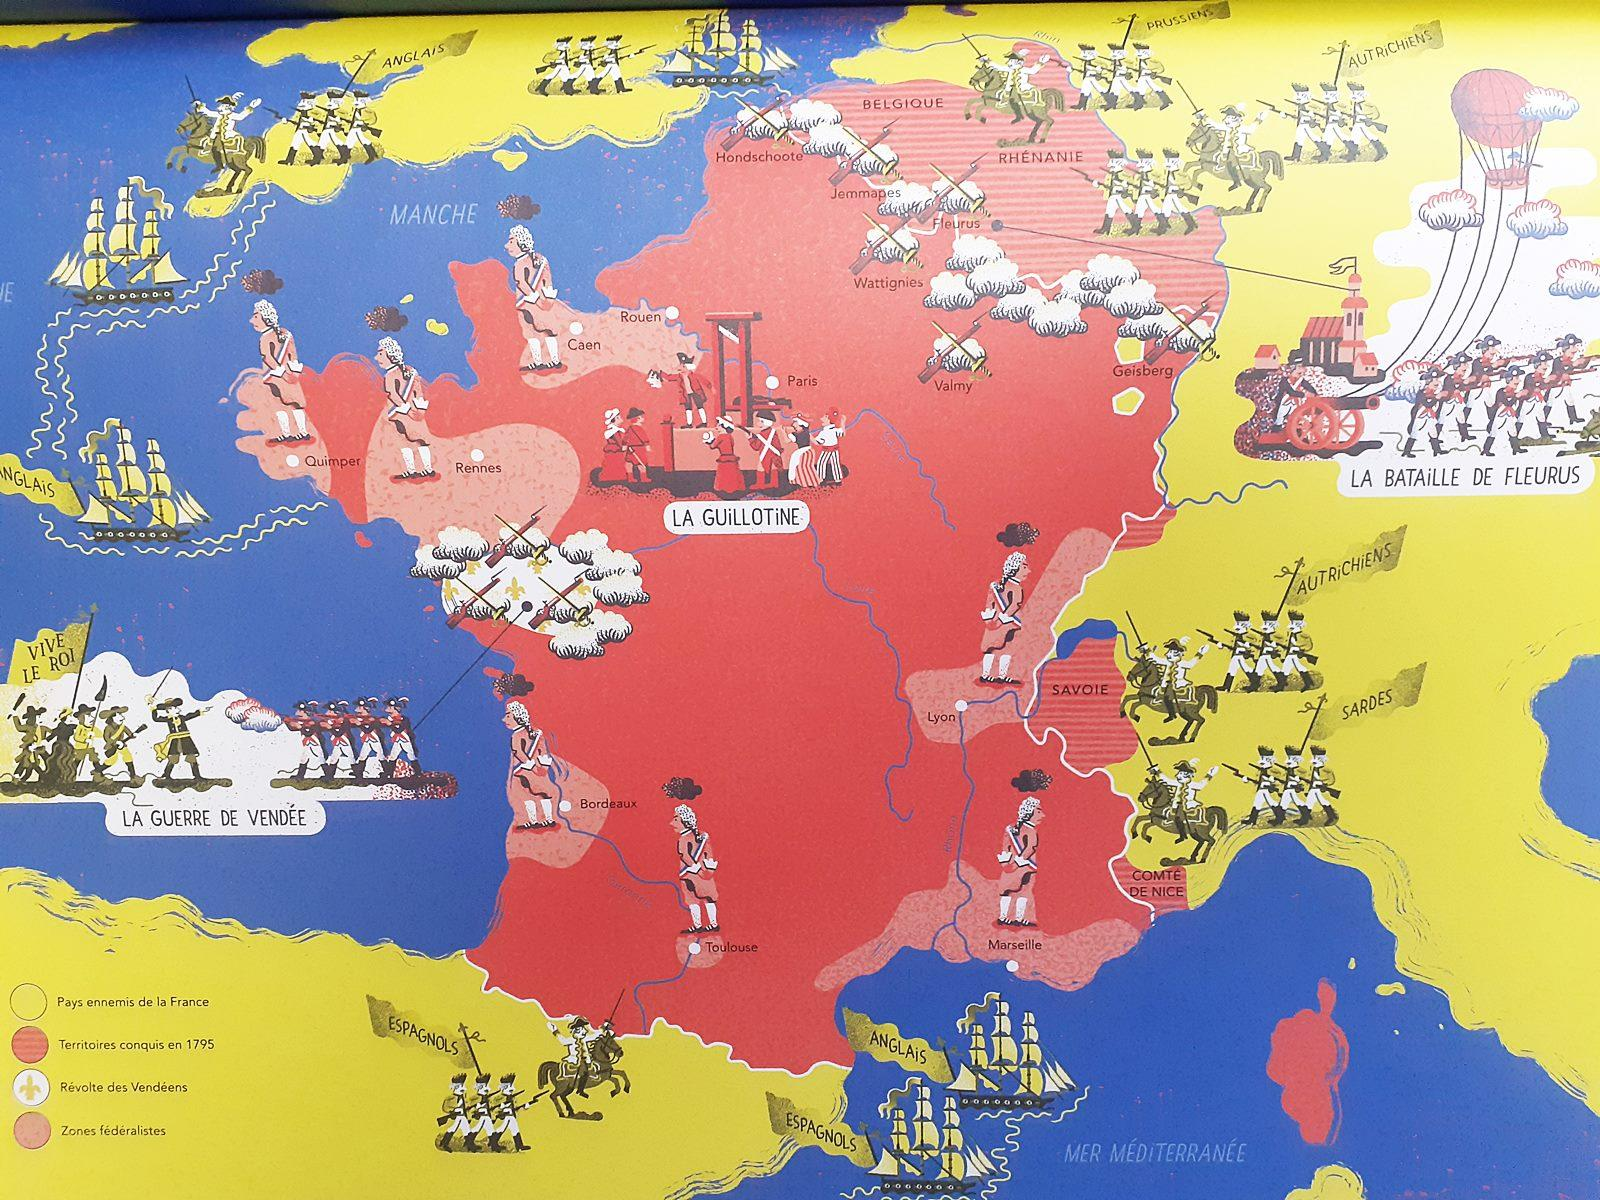 Atlas histoire france20210825 142831